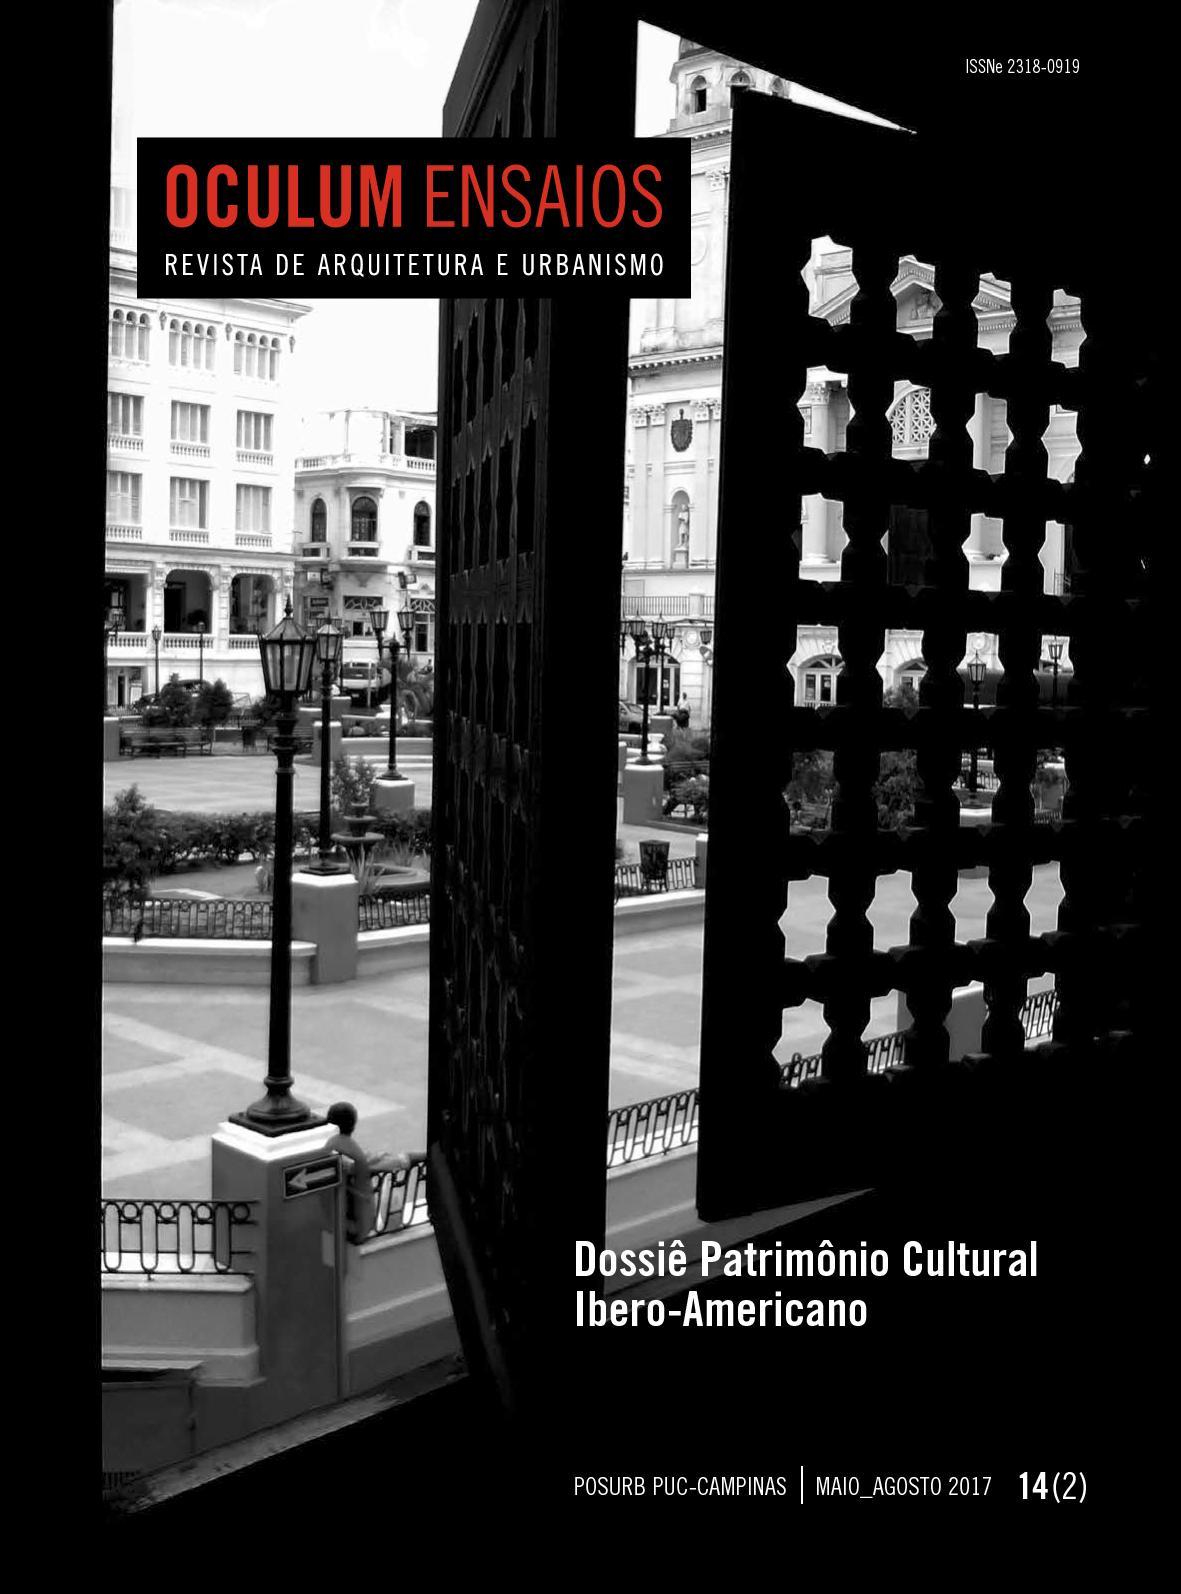 9606c4a94985f Calaméo - Oculum N 14 - Dossiê Patrimônio Cultural Ibero-Americano -  Arquitetura e Urbanismo